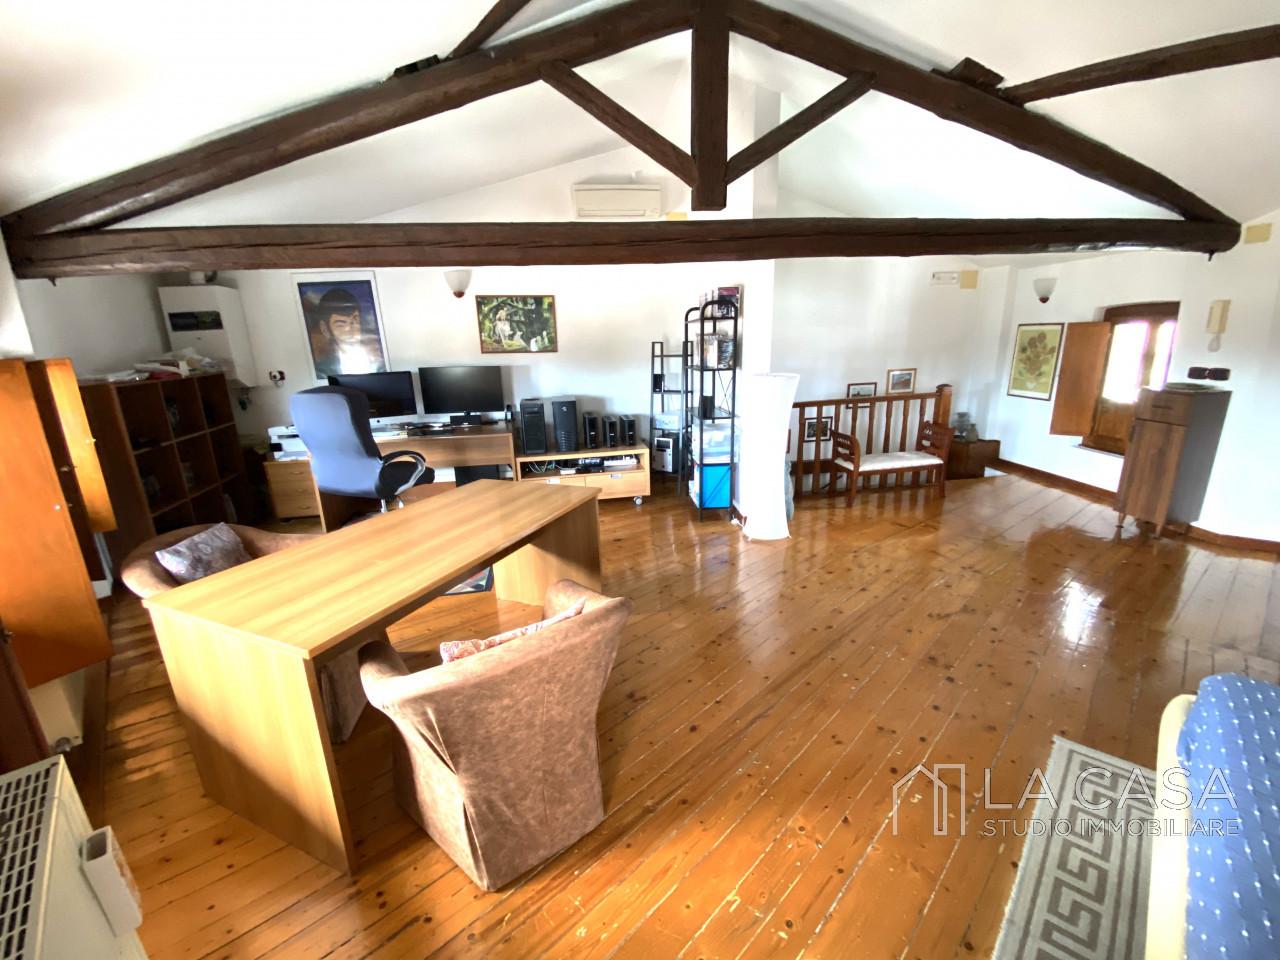 Palazzo plurifamiliare in vendita a Valvasone Arzene - Rif. P3 https://images.gestionaleimmobiliare.it/foto/annunci/200827/2284141/1280x1280/017__img_3729_wmk_0.jpg